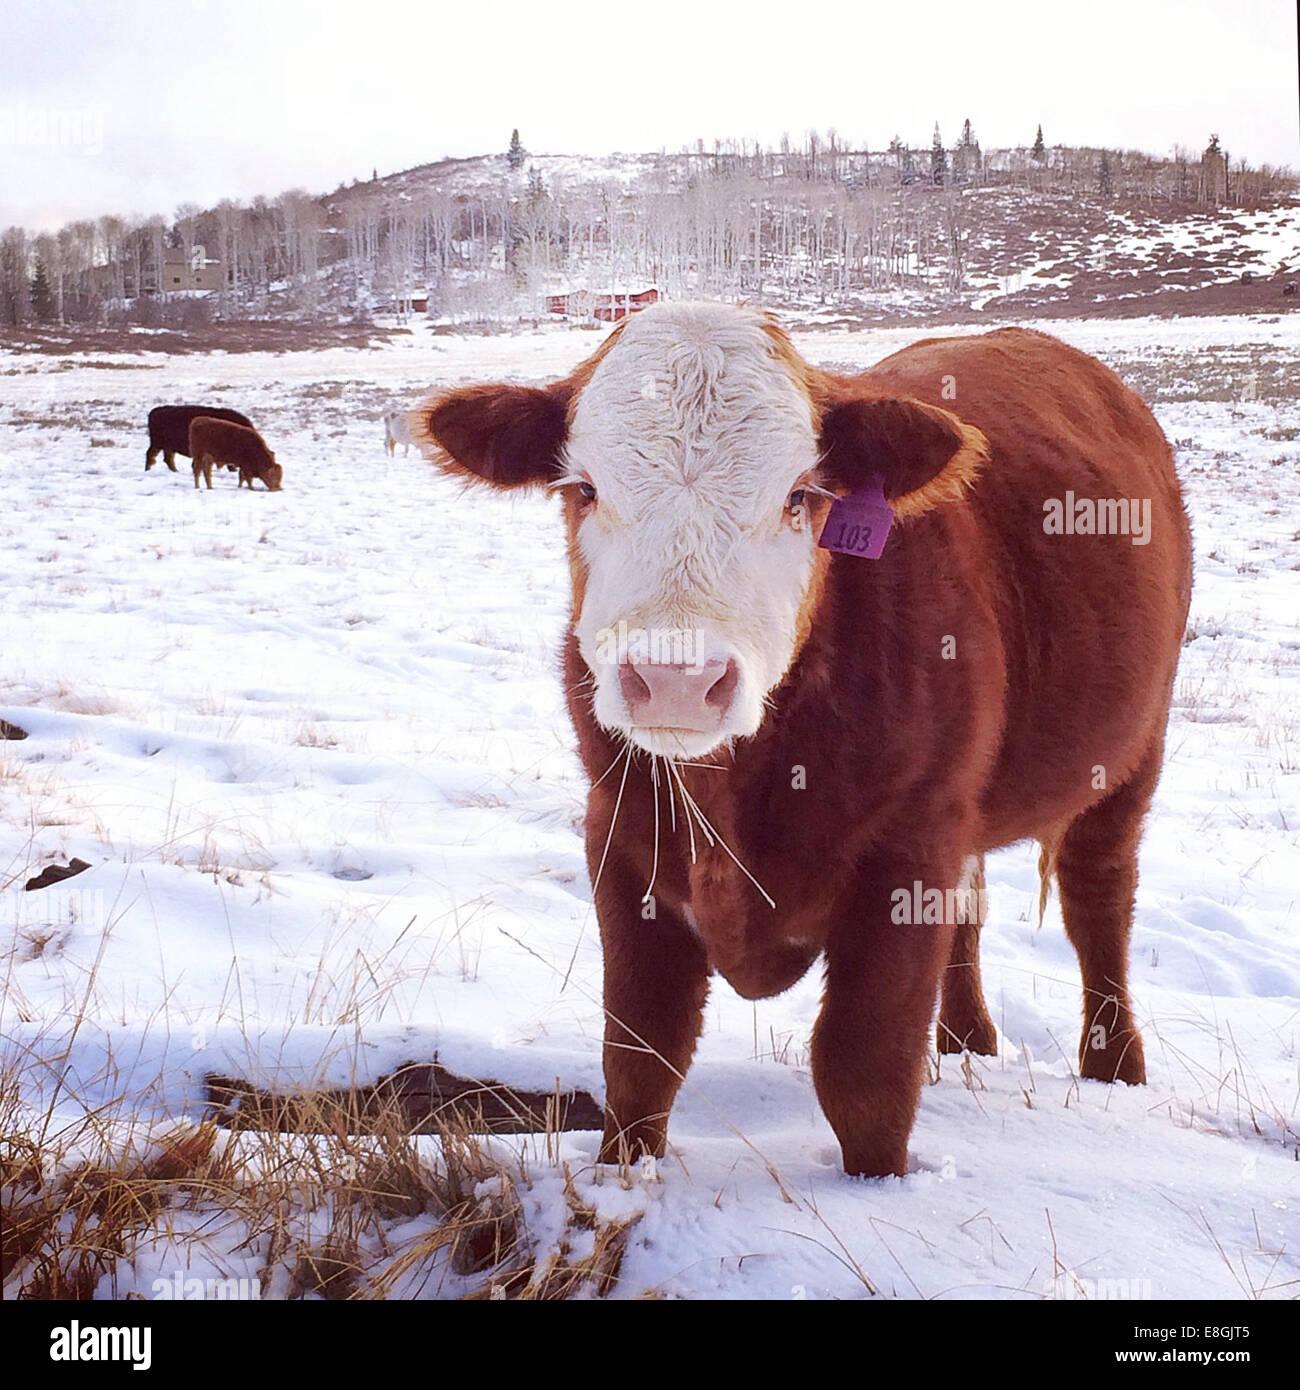 Kuh stehend im Feld im Schnee, Springdale, Utah, Amerika, USA Stockbild